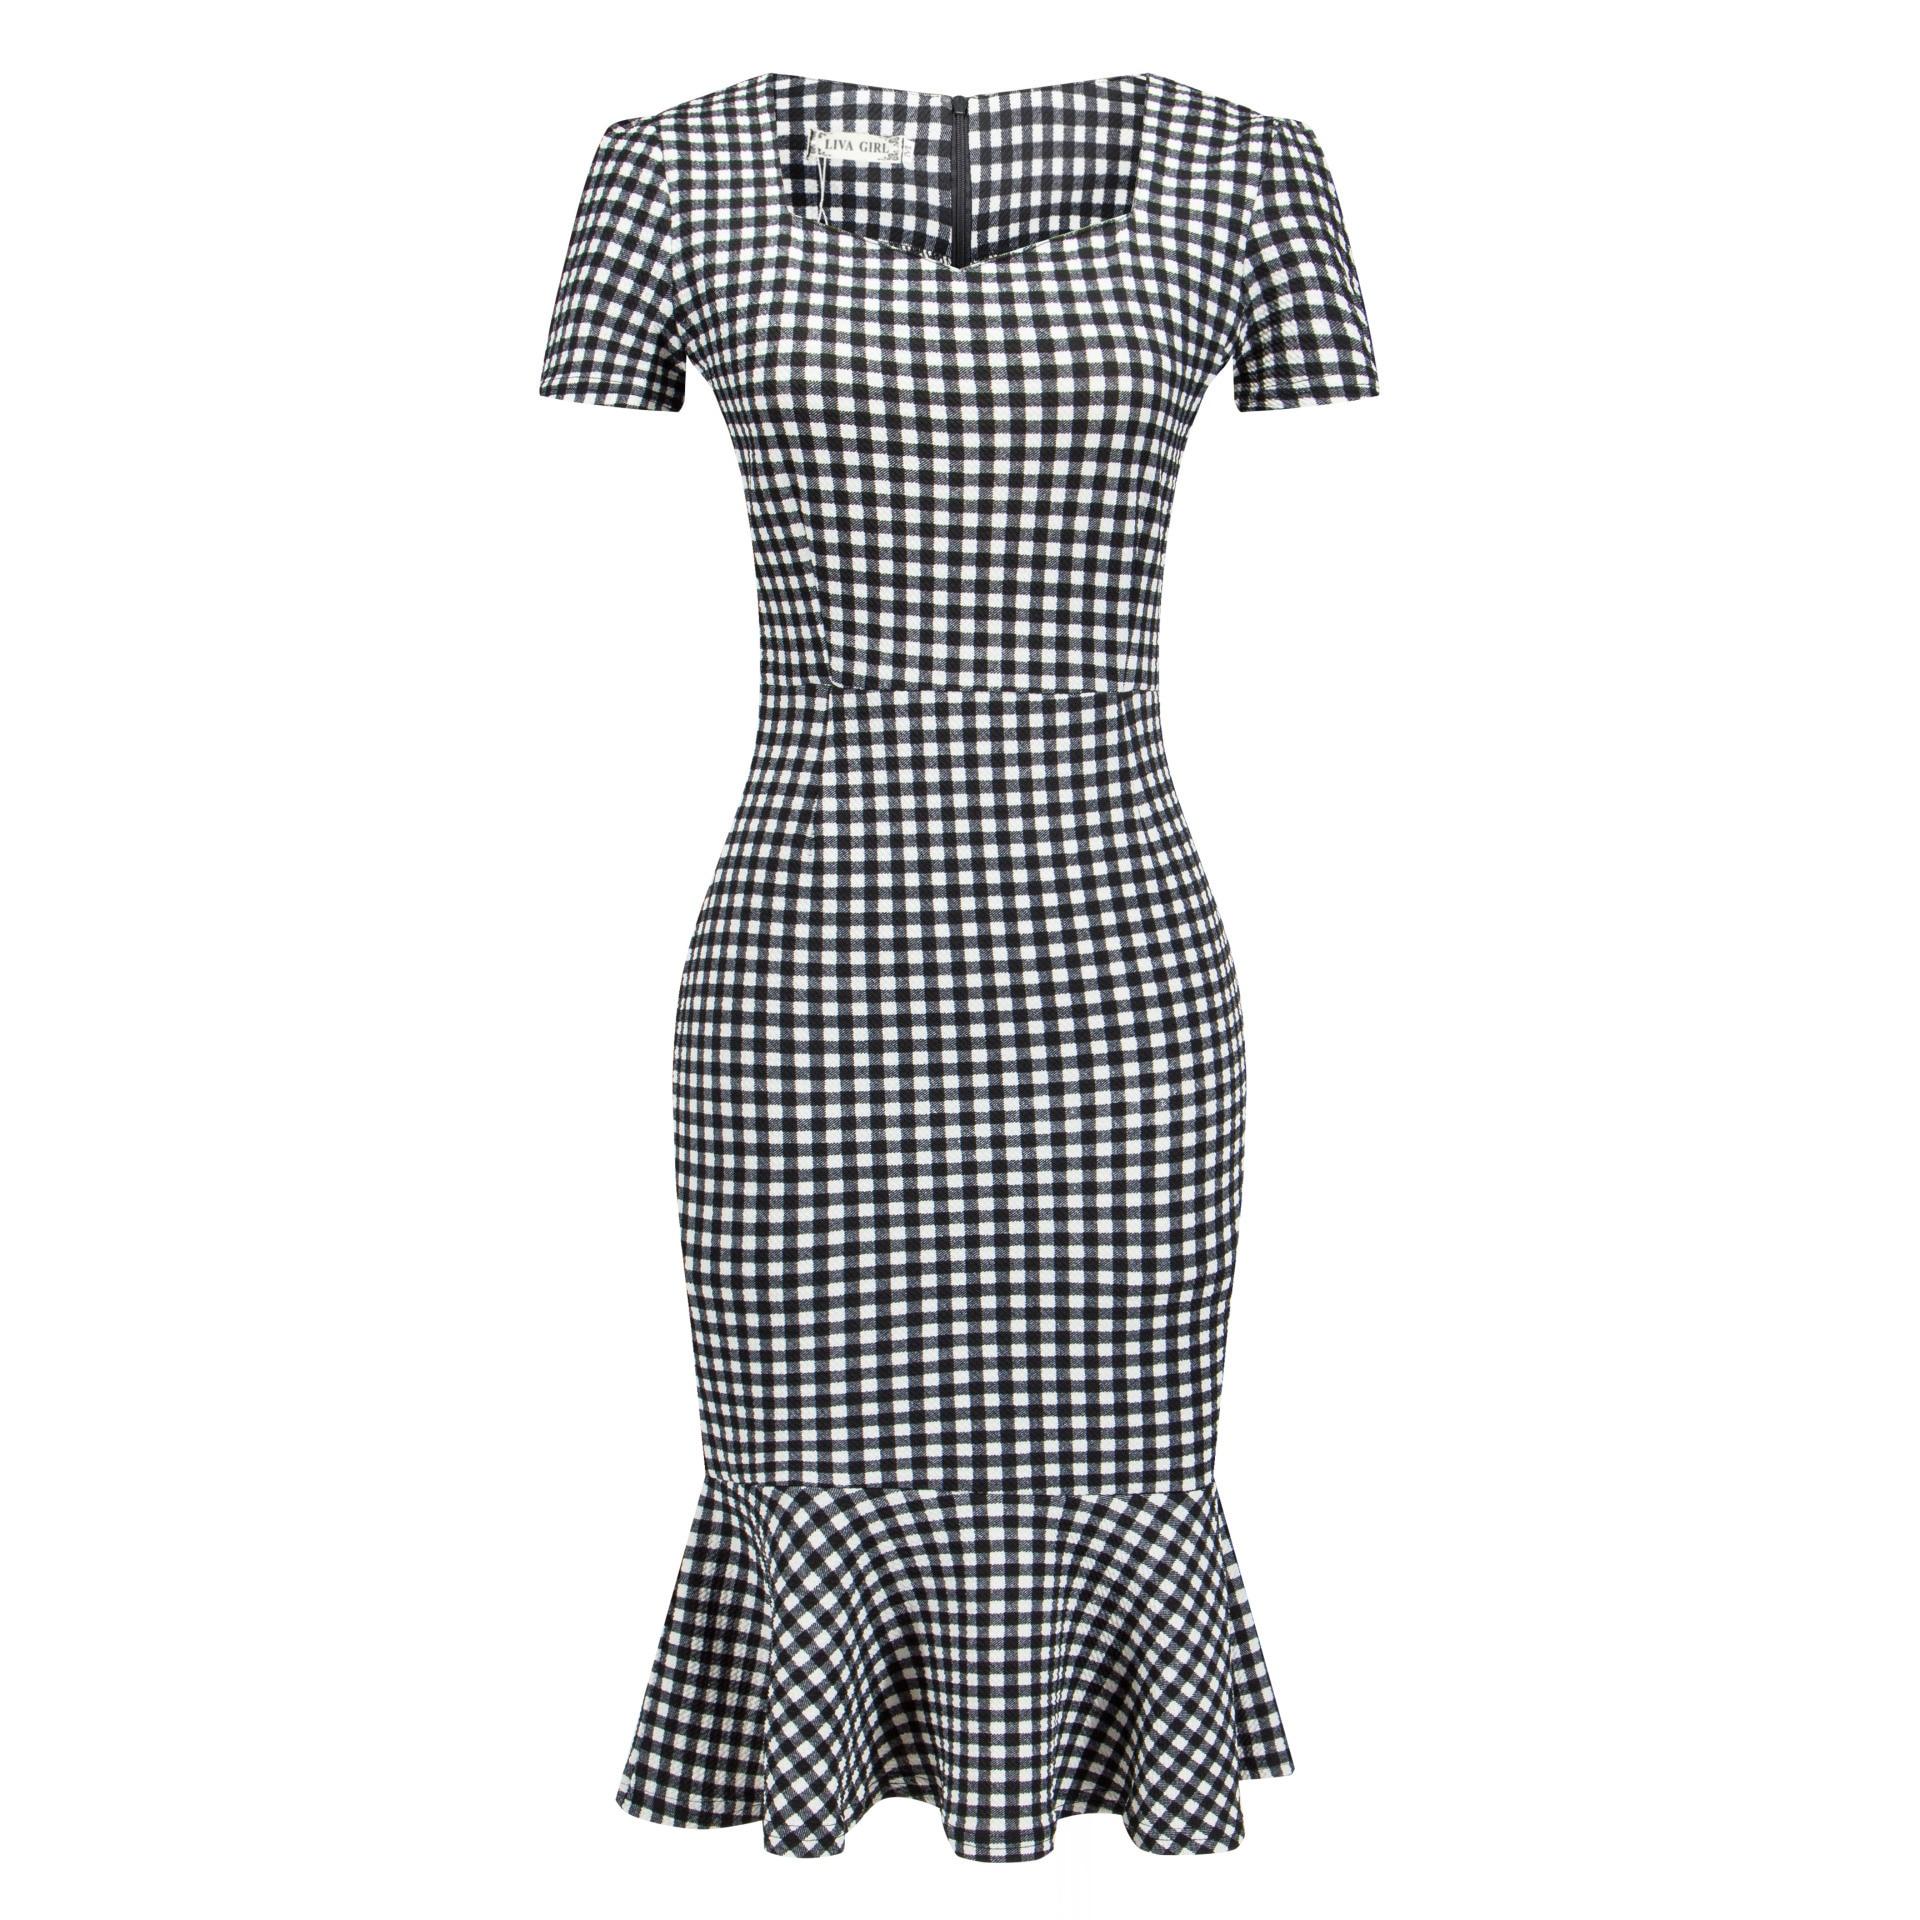 2fb1d9ebe8b 2018 Summer Office Midi Dress Women Plus Size Dress Xxxl Mermaid Plaid  Black Elegant Work Lady Dresses Bodycon Formal Fashion-in Dresses from  Women s ...